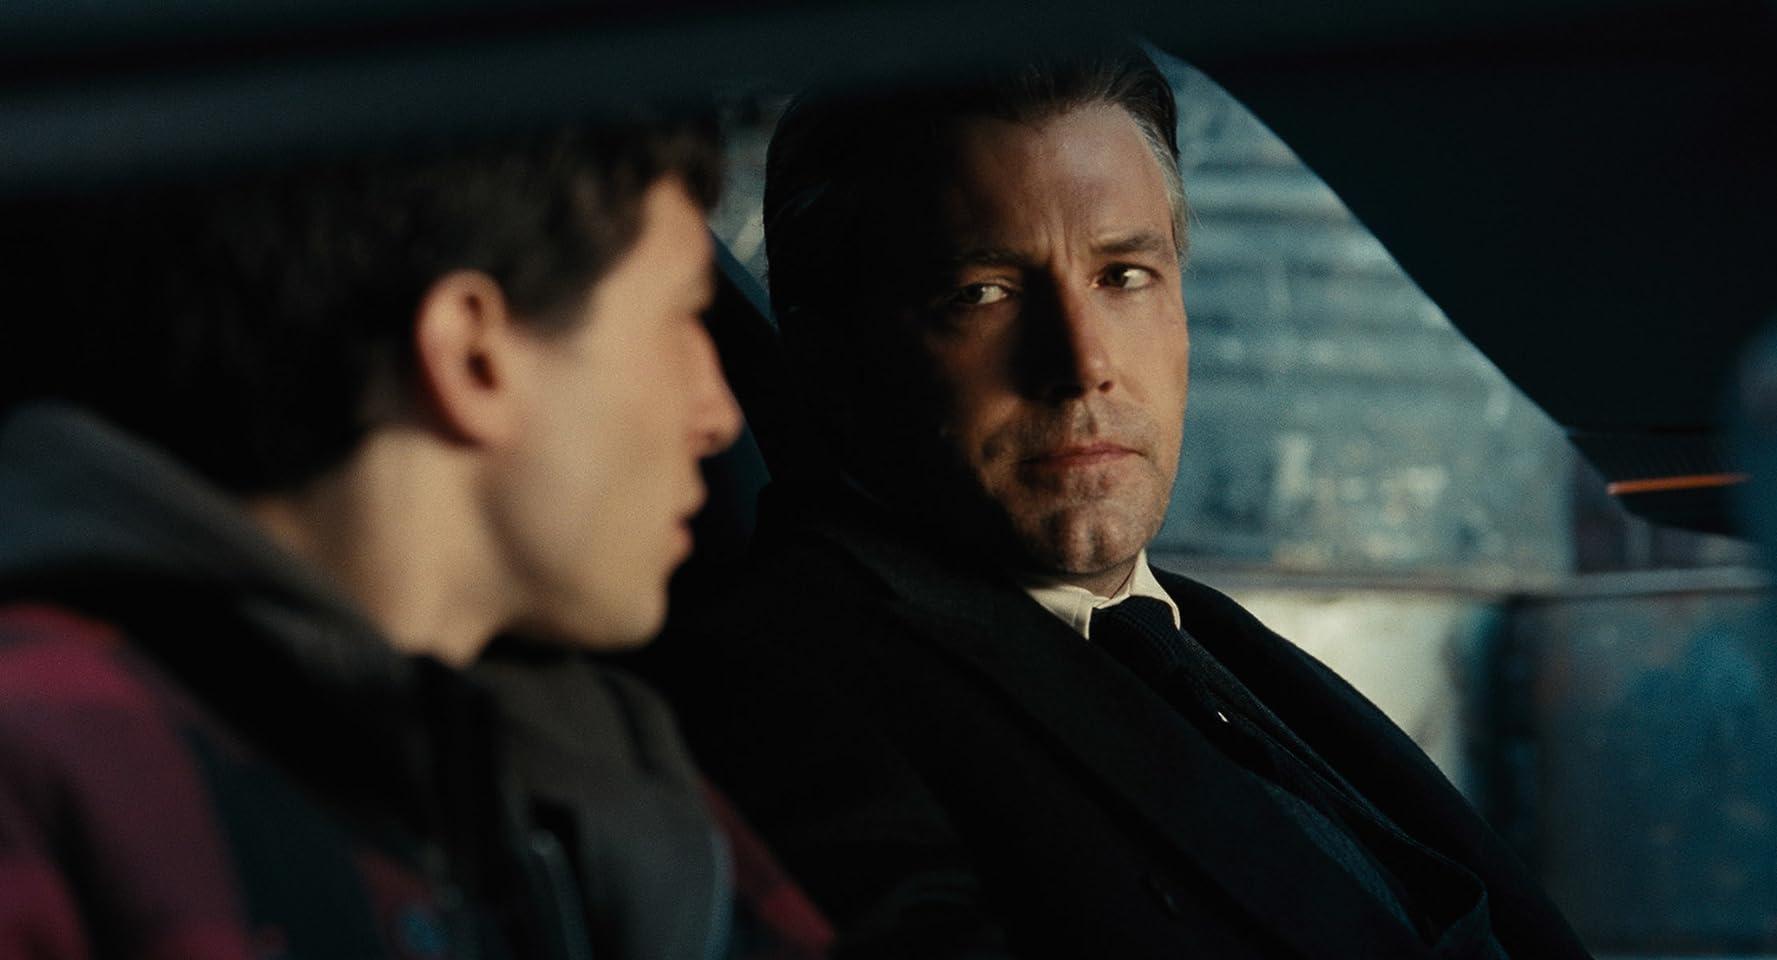 Ben Affleck and Ezra Miller in Justice League (2017)